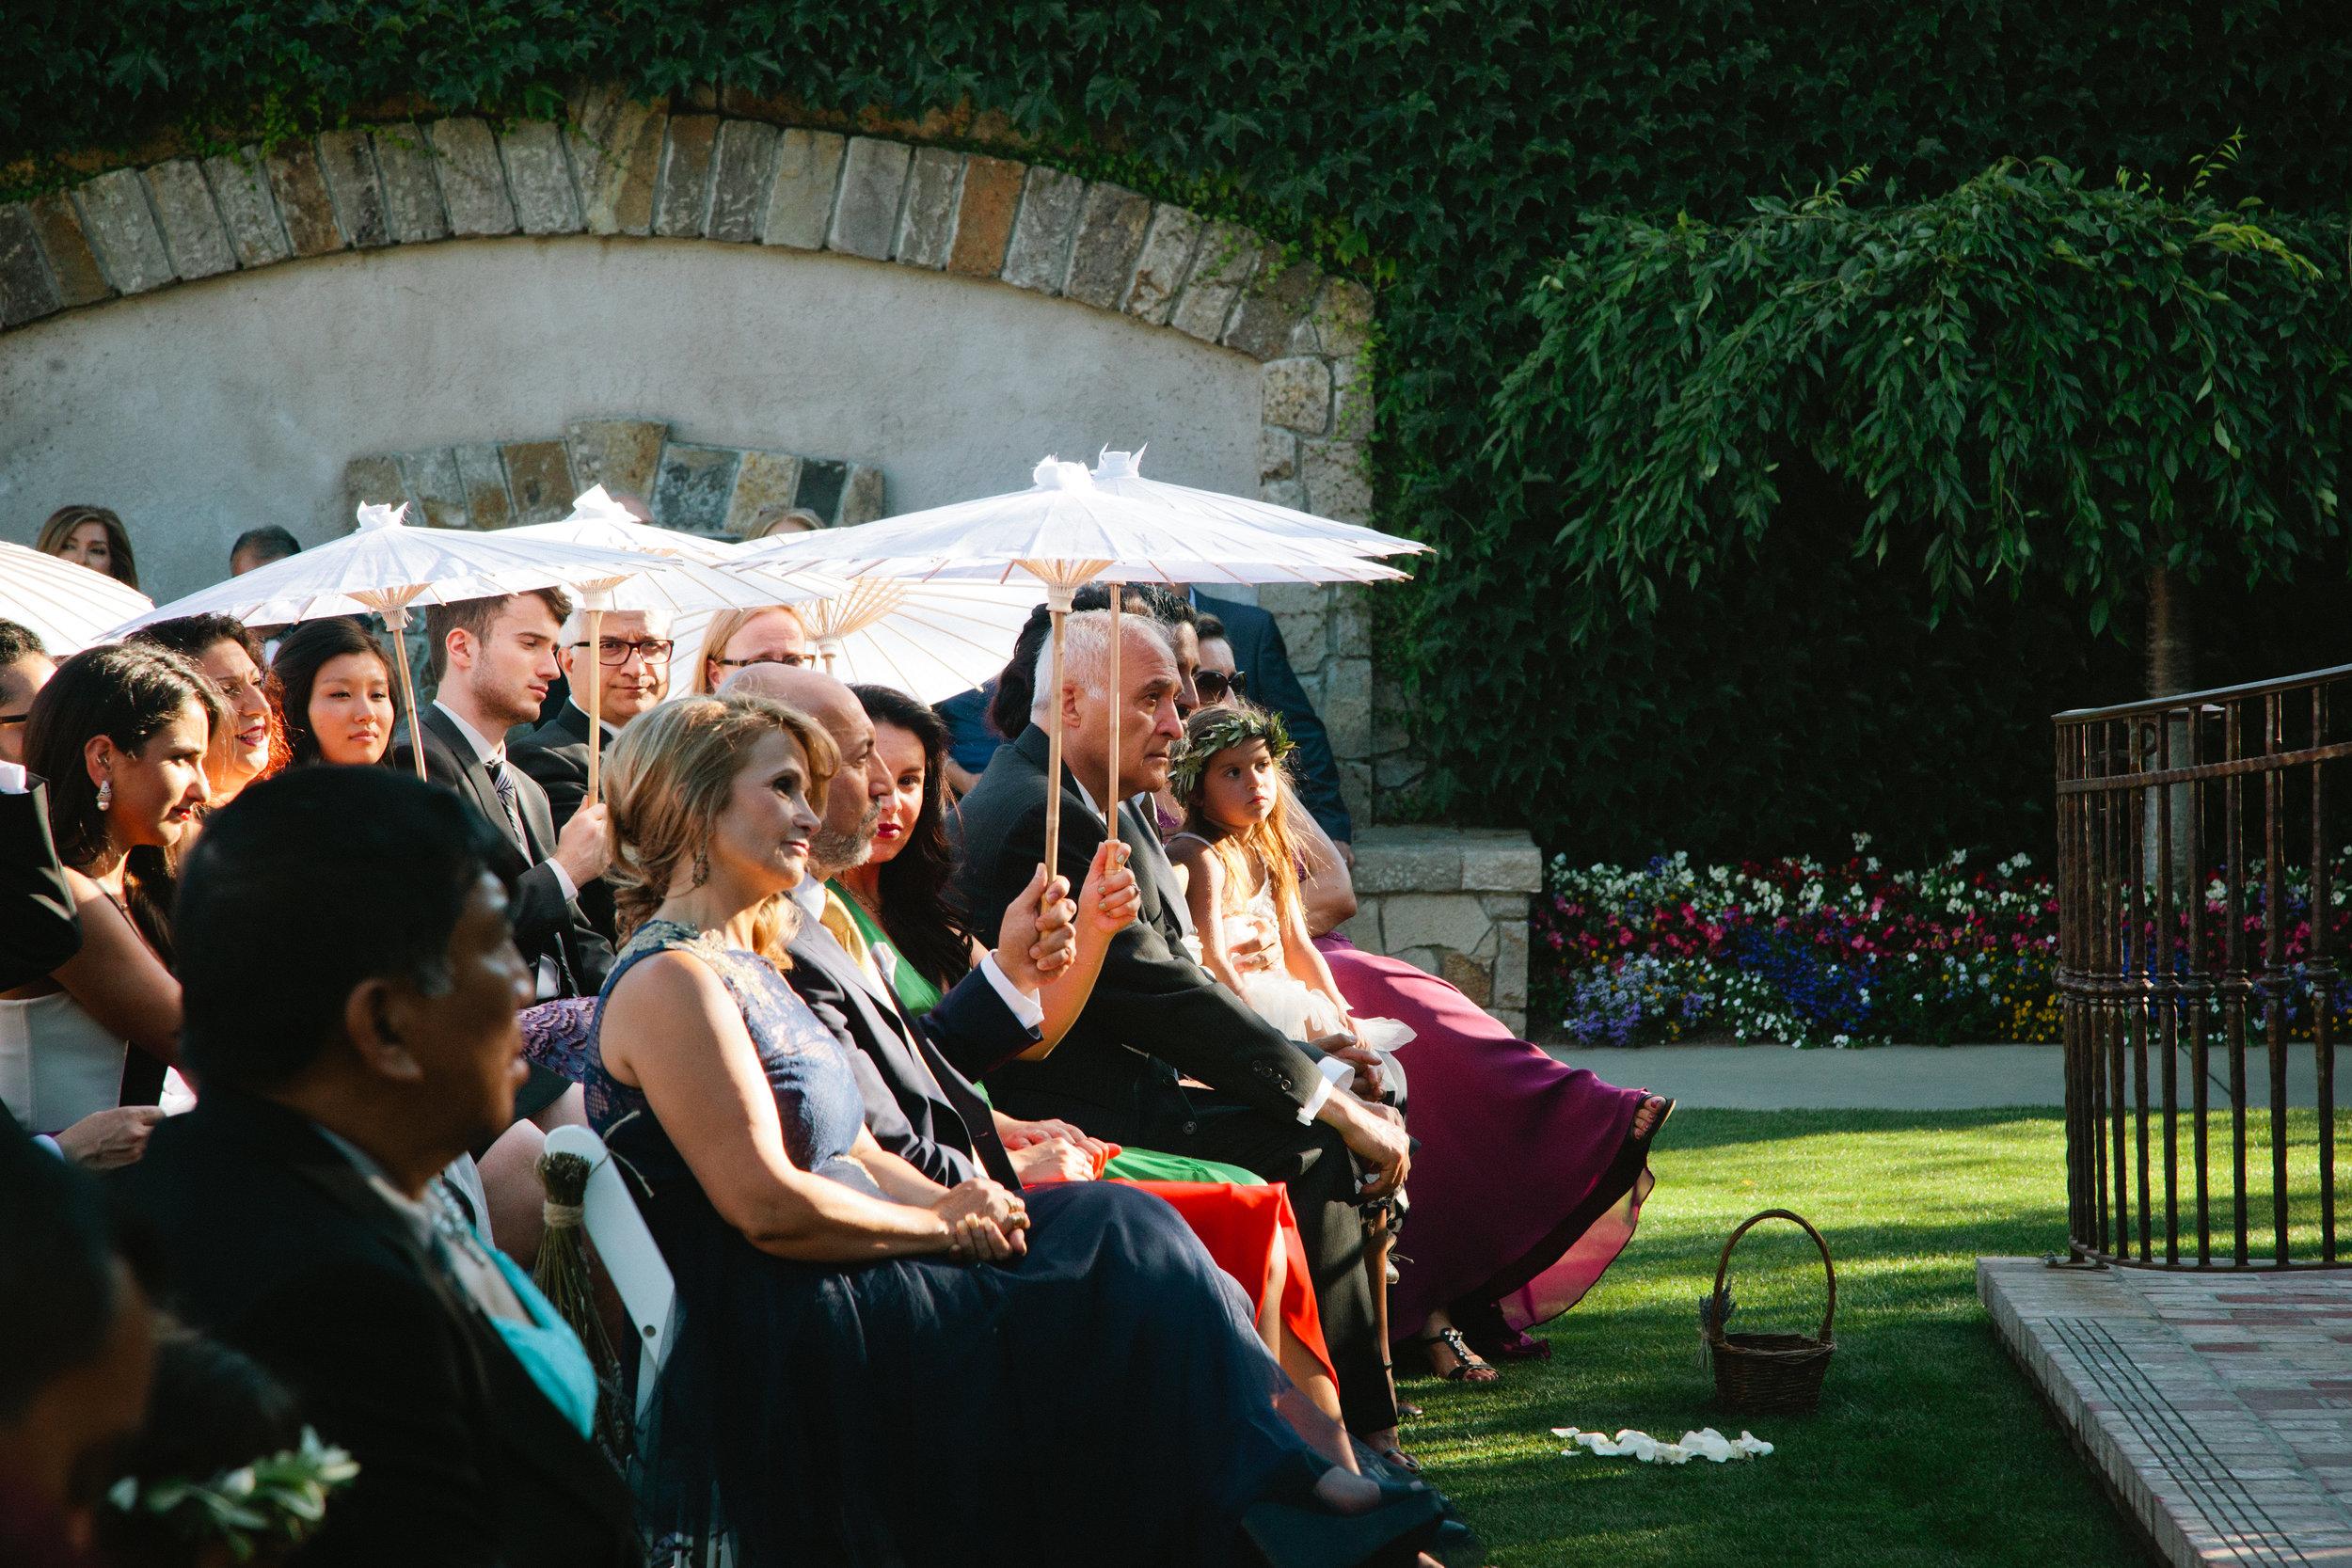 California Wedding Photographer Elopement Travel Destination Napa Valley Elope Couple Photography Lifestyle Candid Artistic Creative Bohemian Romantic Real Persian Vineyard Inspiration Venue